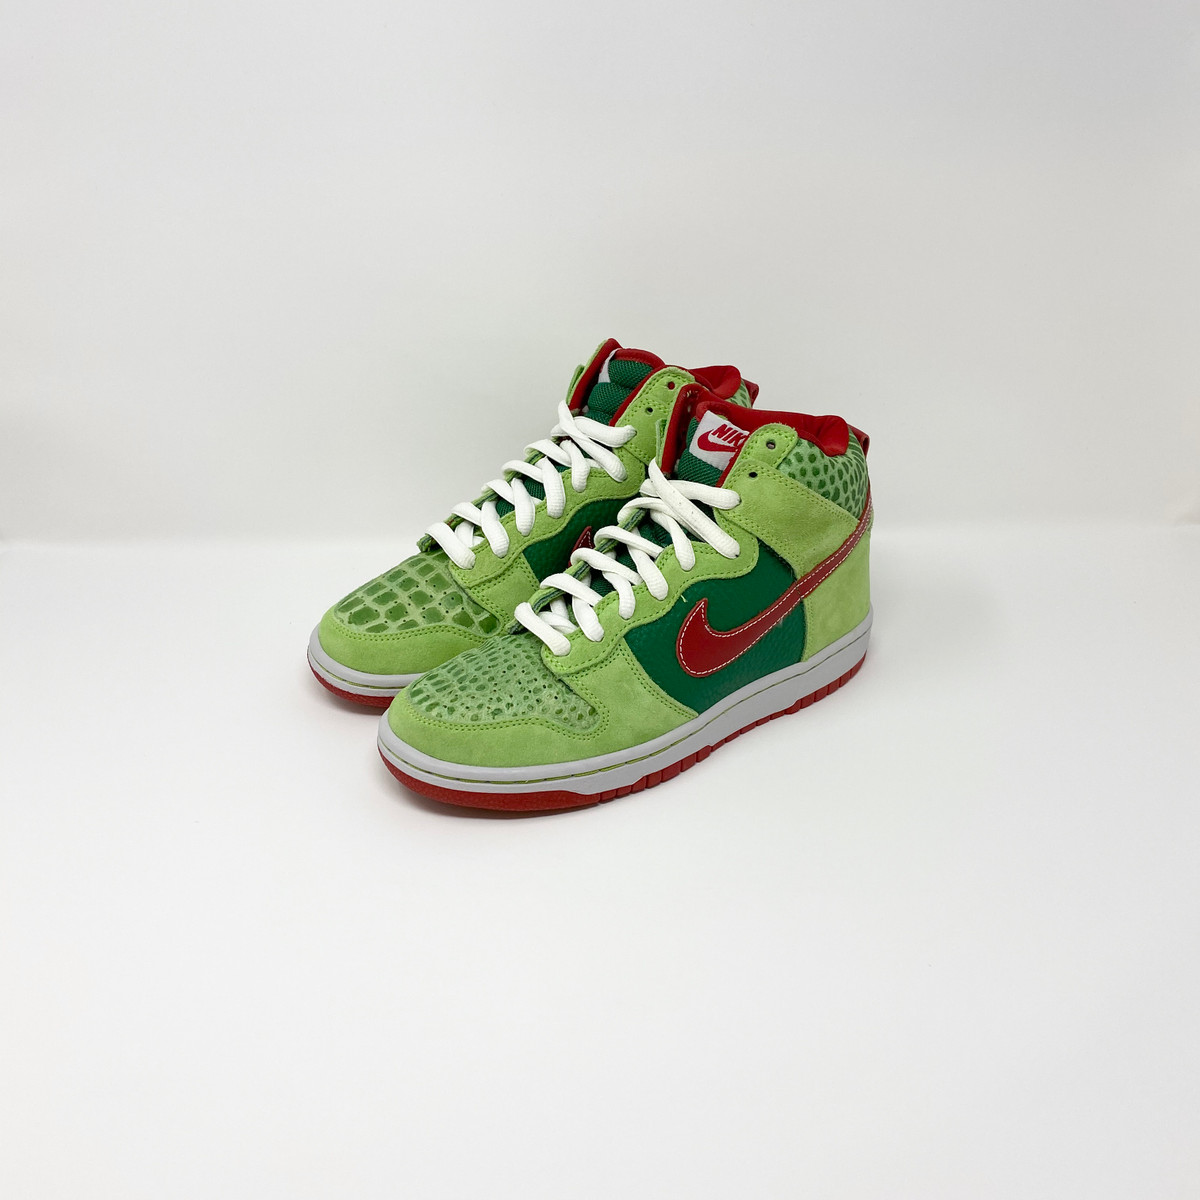 Nike Dunk Hi Pro SB Pro Dr. Feelgood